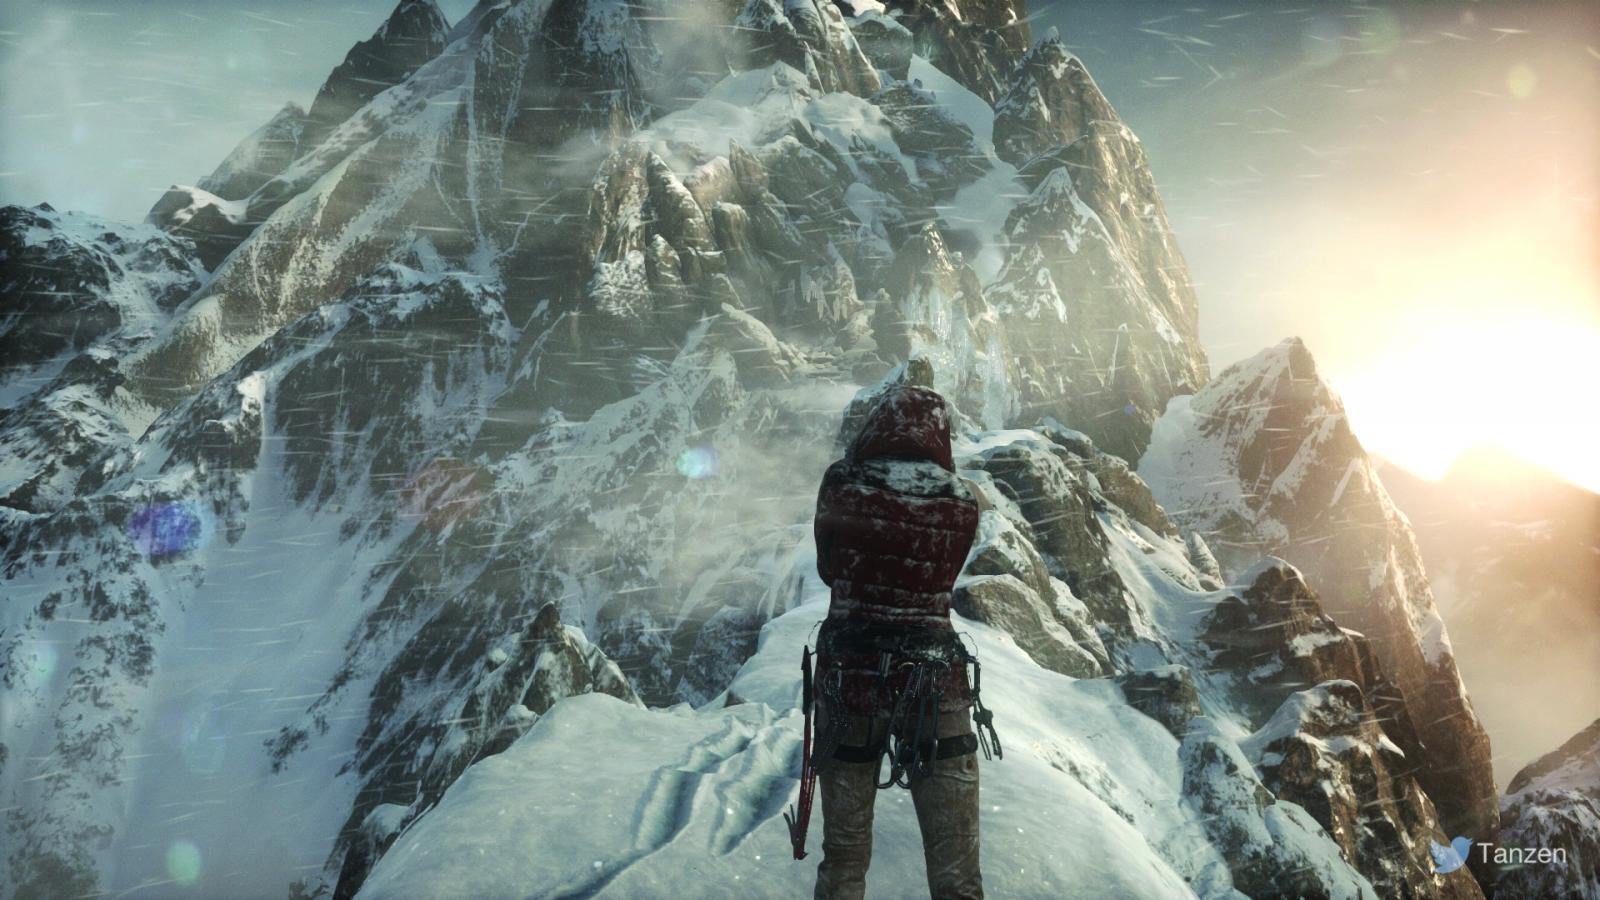 Rise of the Tomb Raider Screen Shot 09.11.15 20. 27_watermark